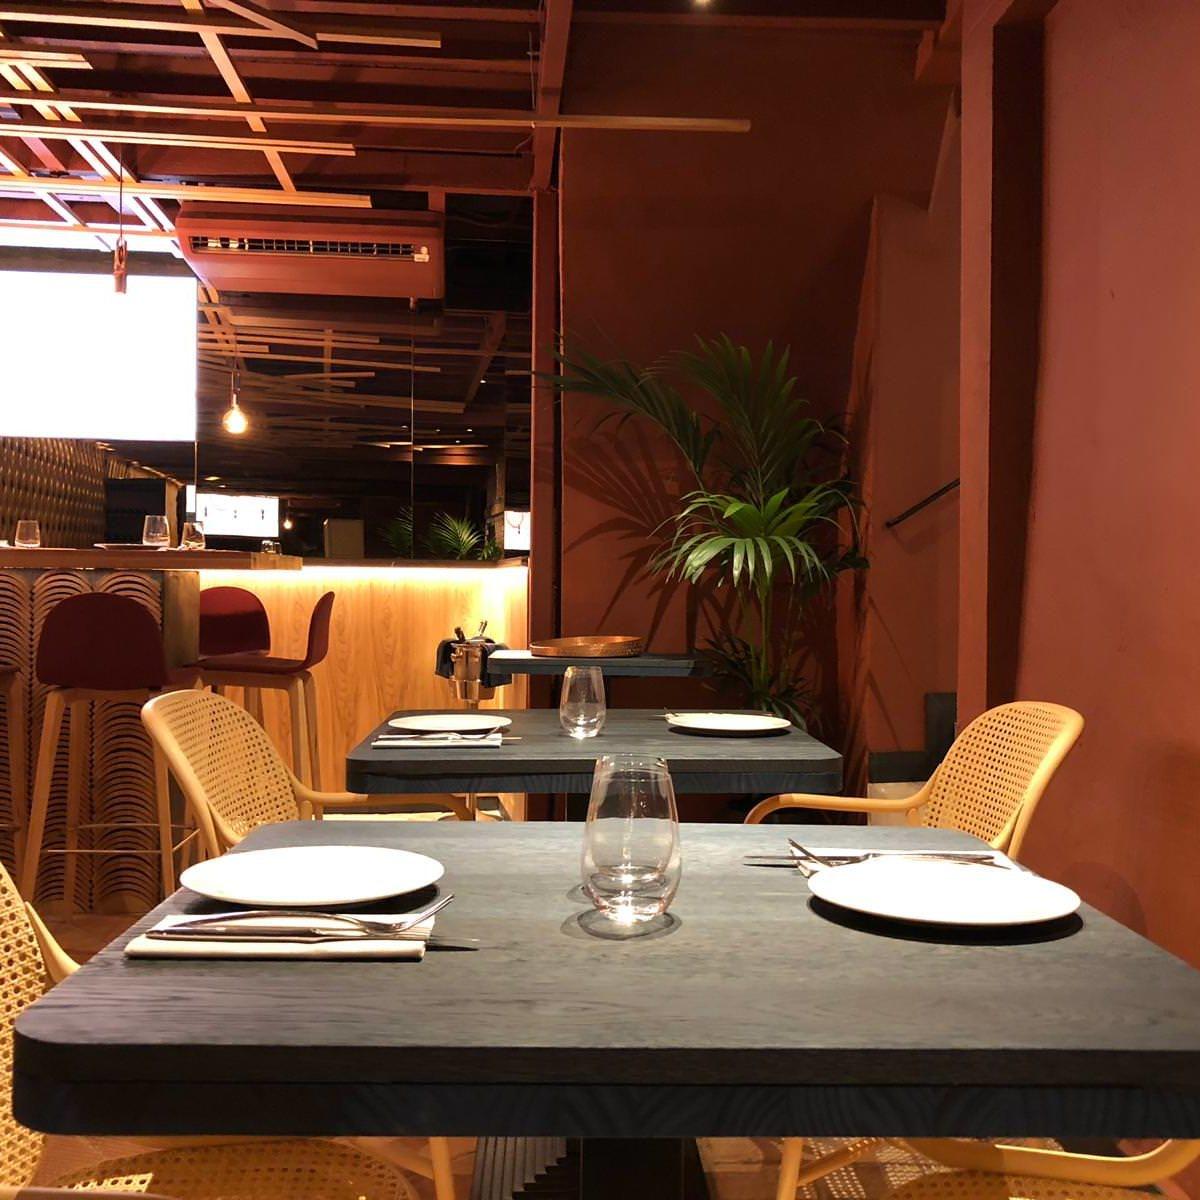 restaurant-in-palma-de-mallorca